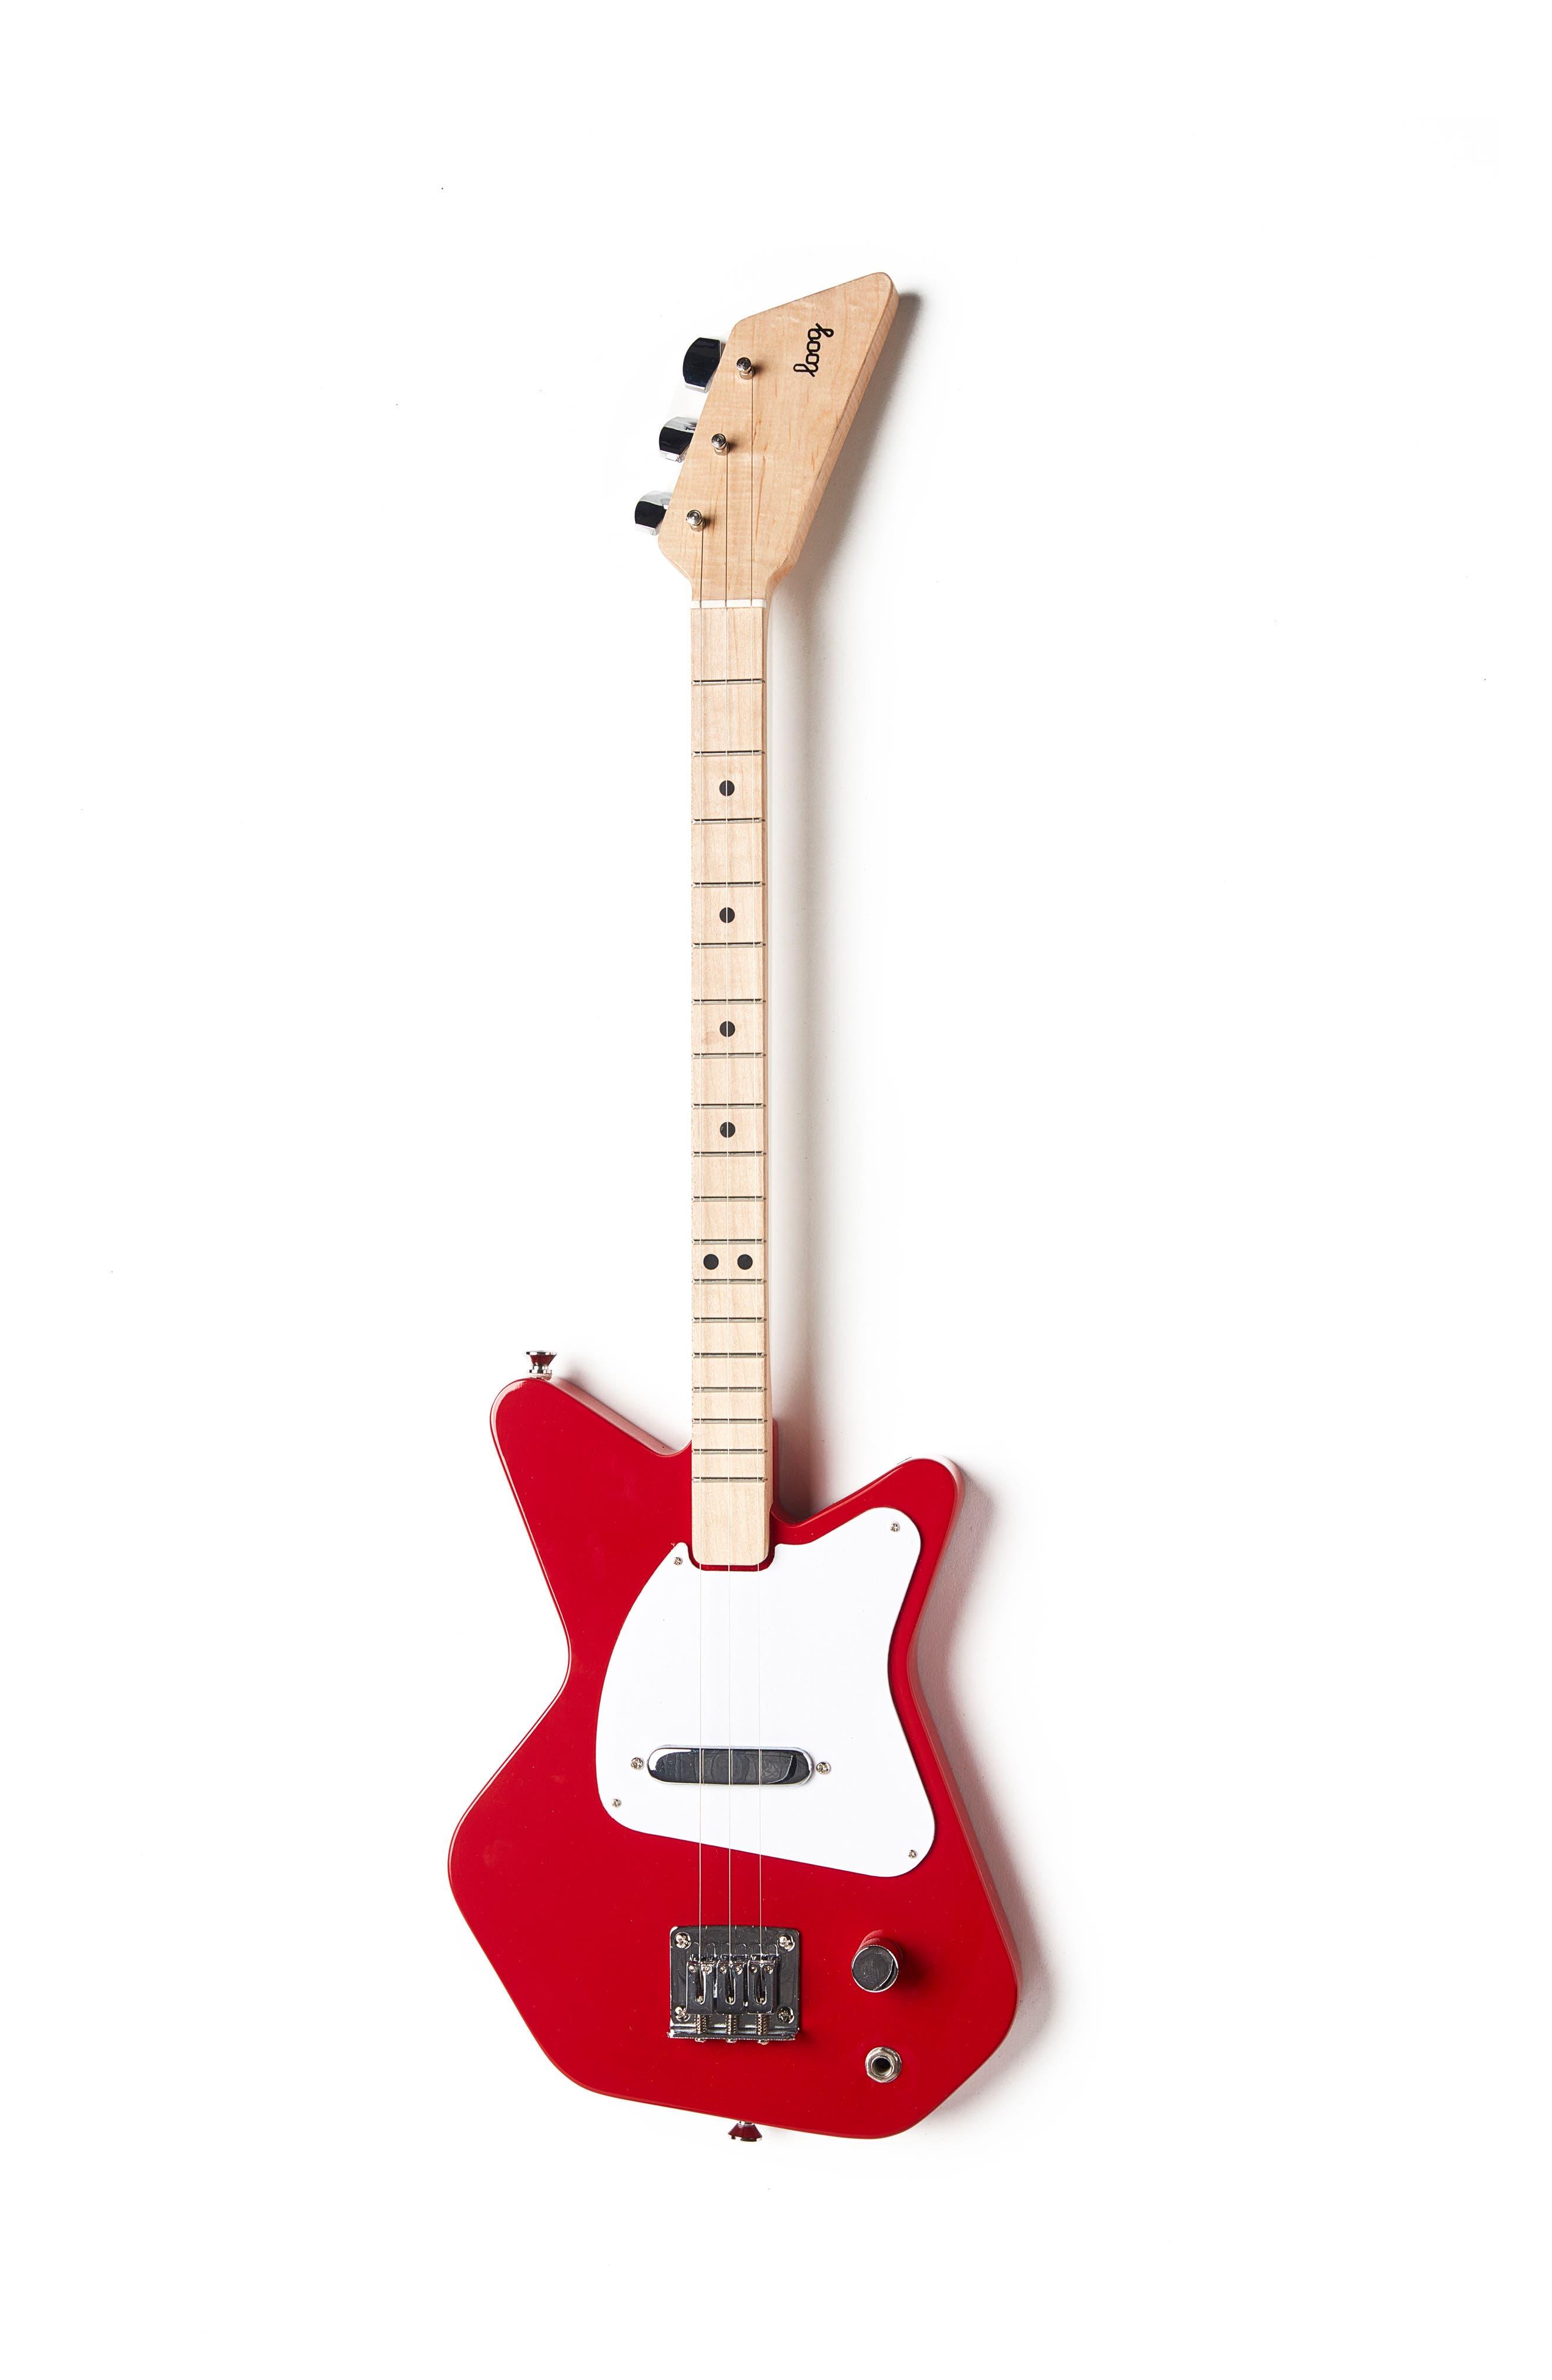 Loog Pro 3-String Electric Guitar